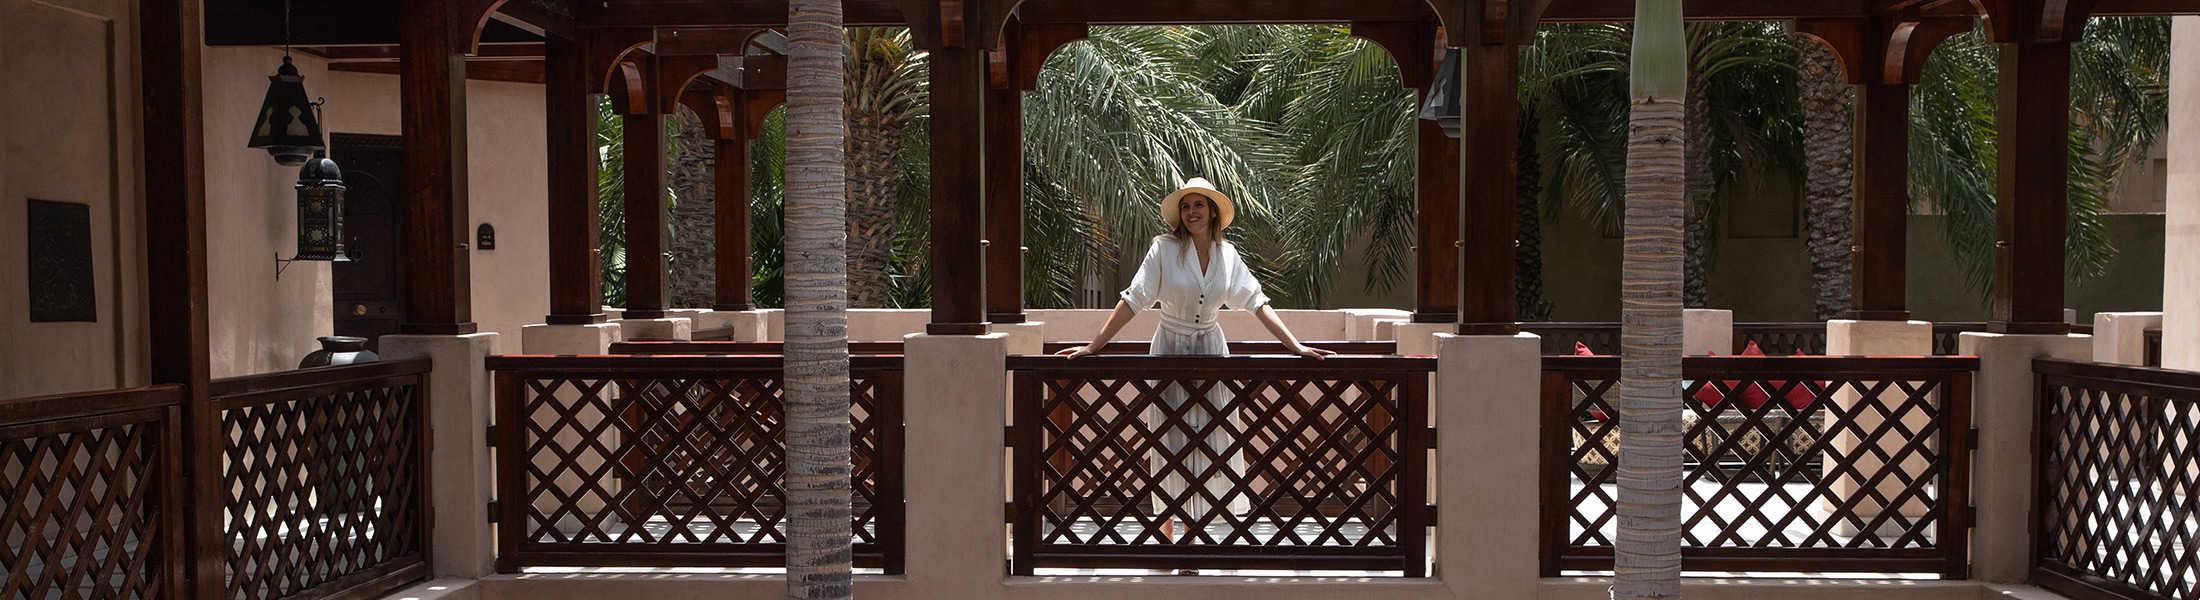 Woman on the elevated walkway at Jumeirah Dar Al Masyaf